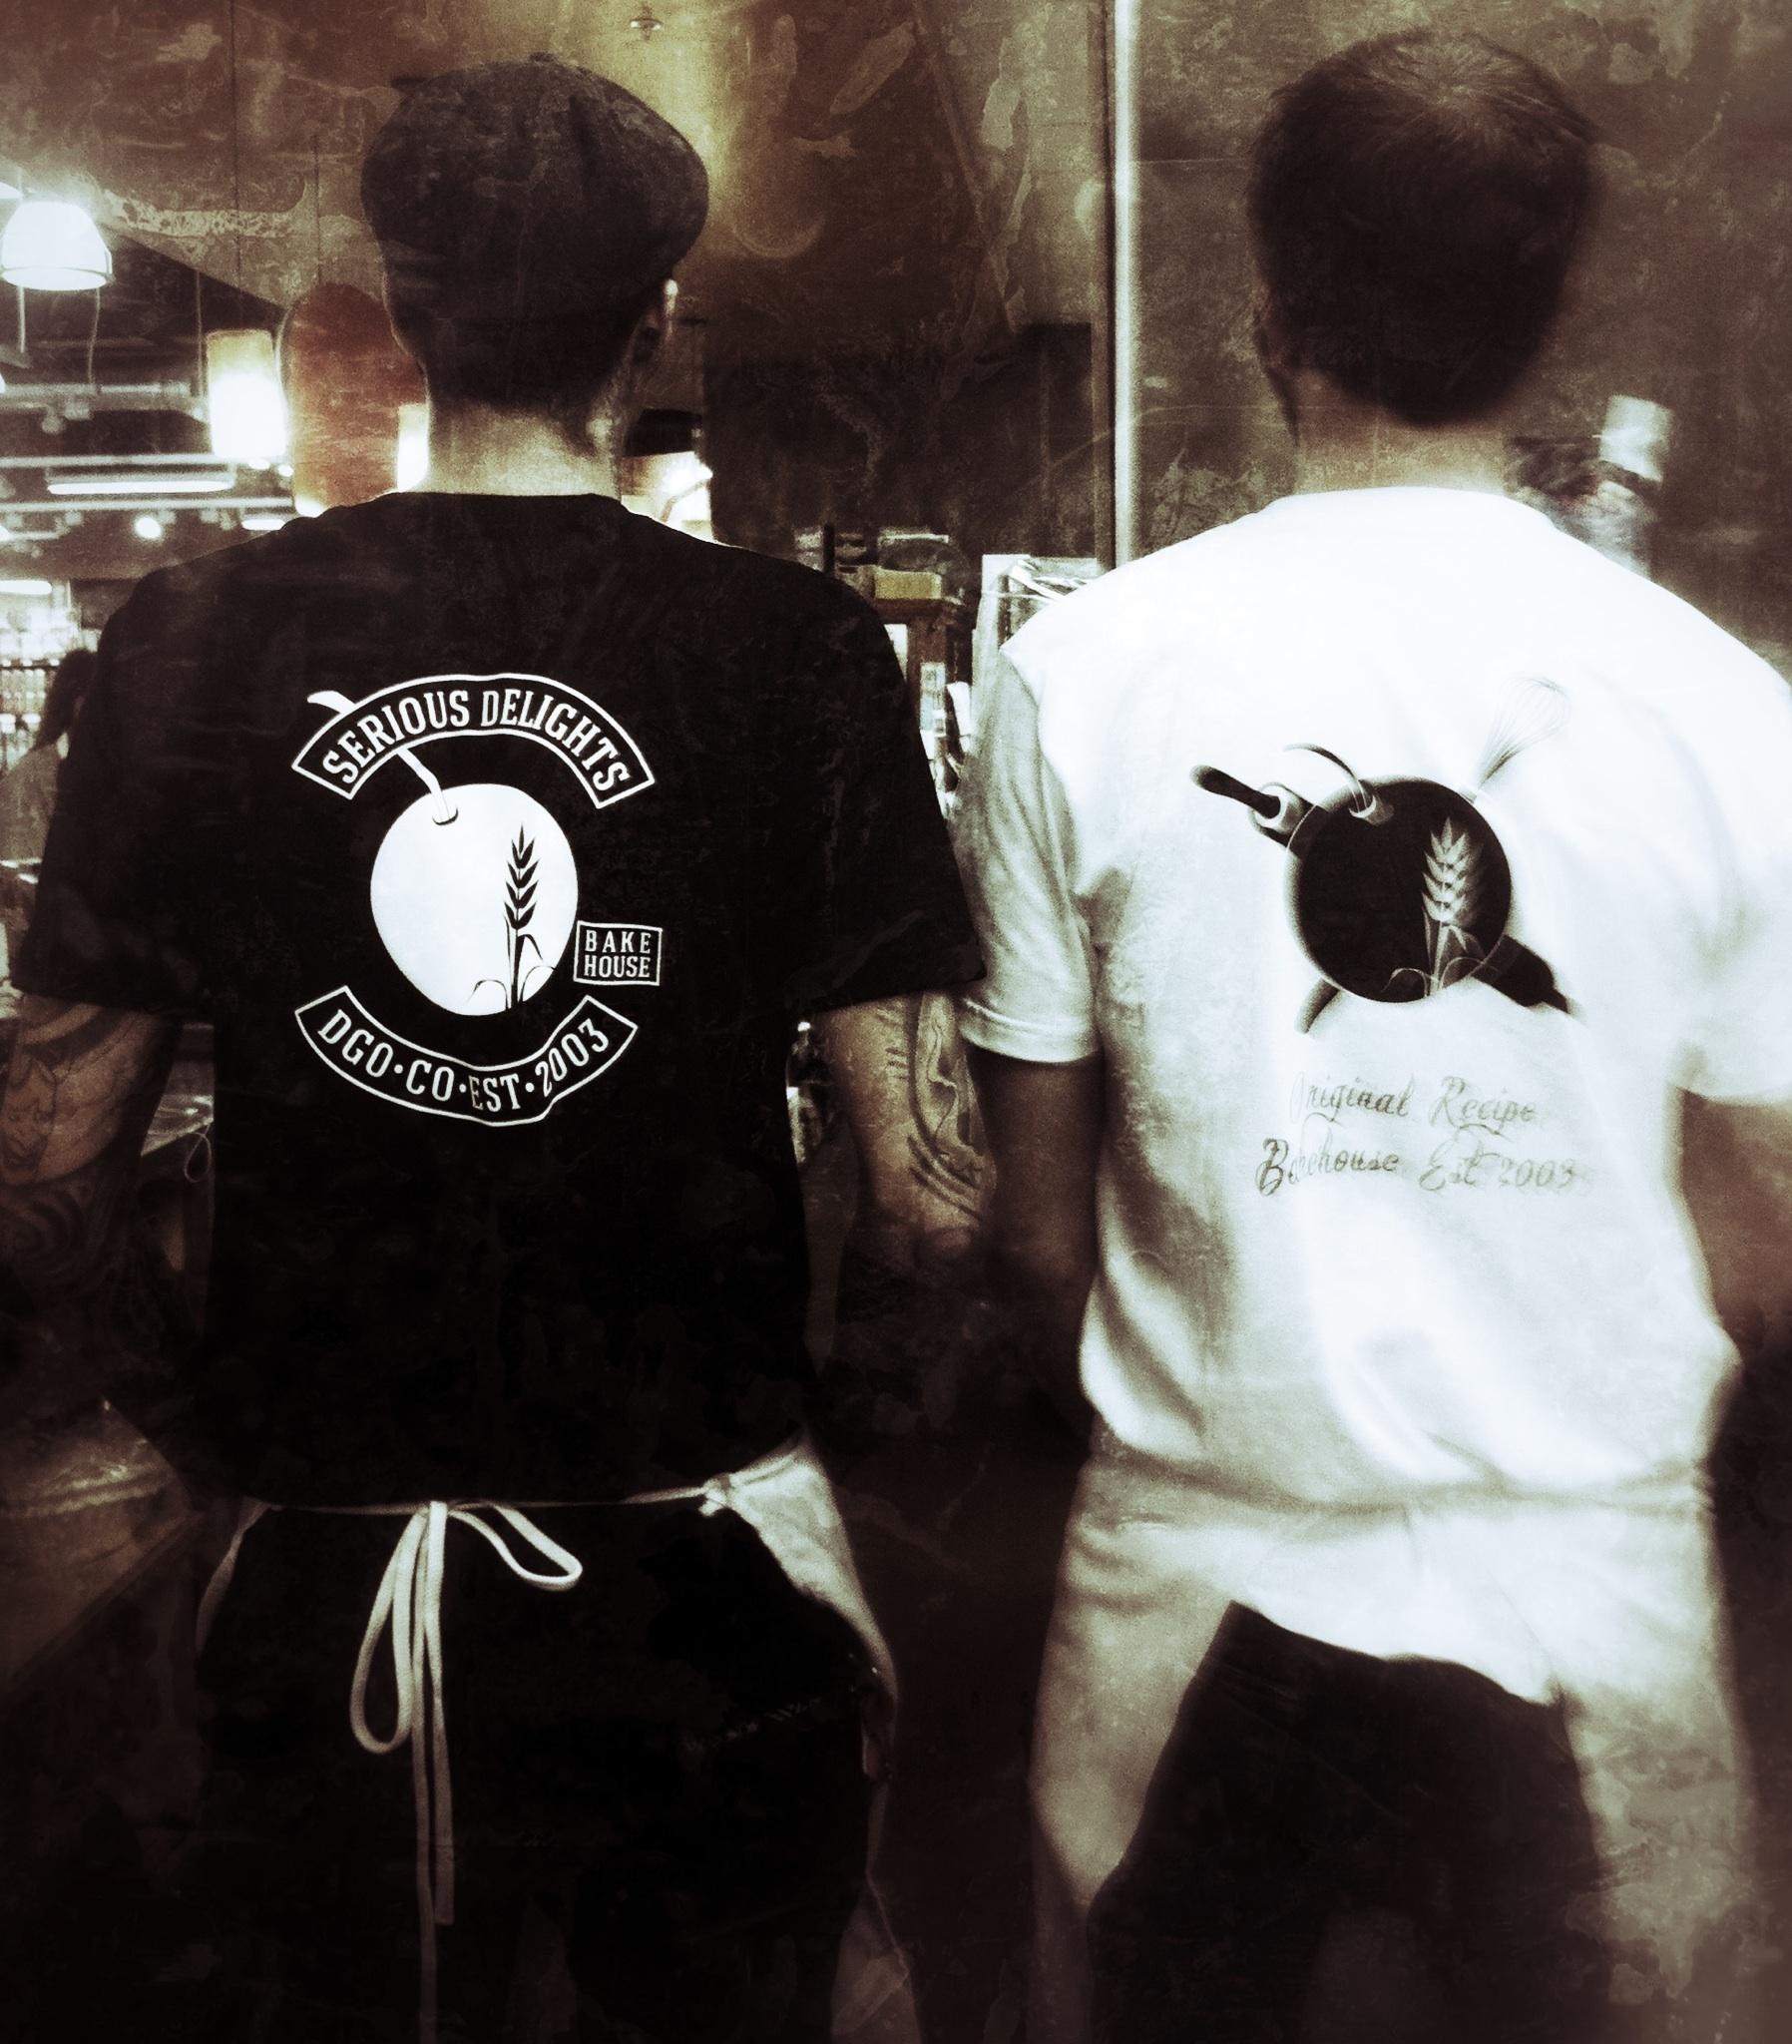 Design your own t shirt infant - Sd Bakery Boys T Shirt Photo